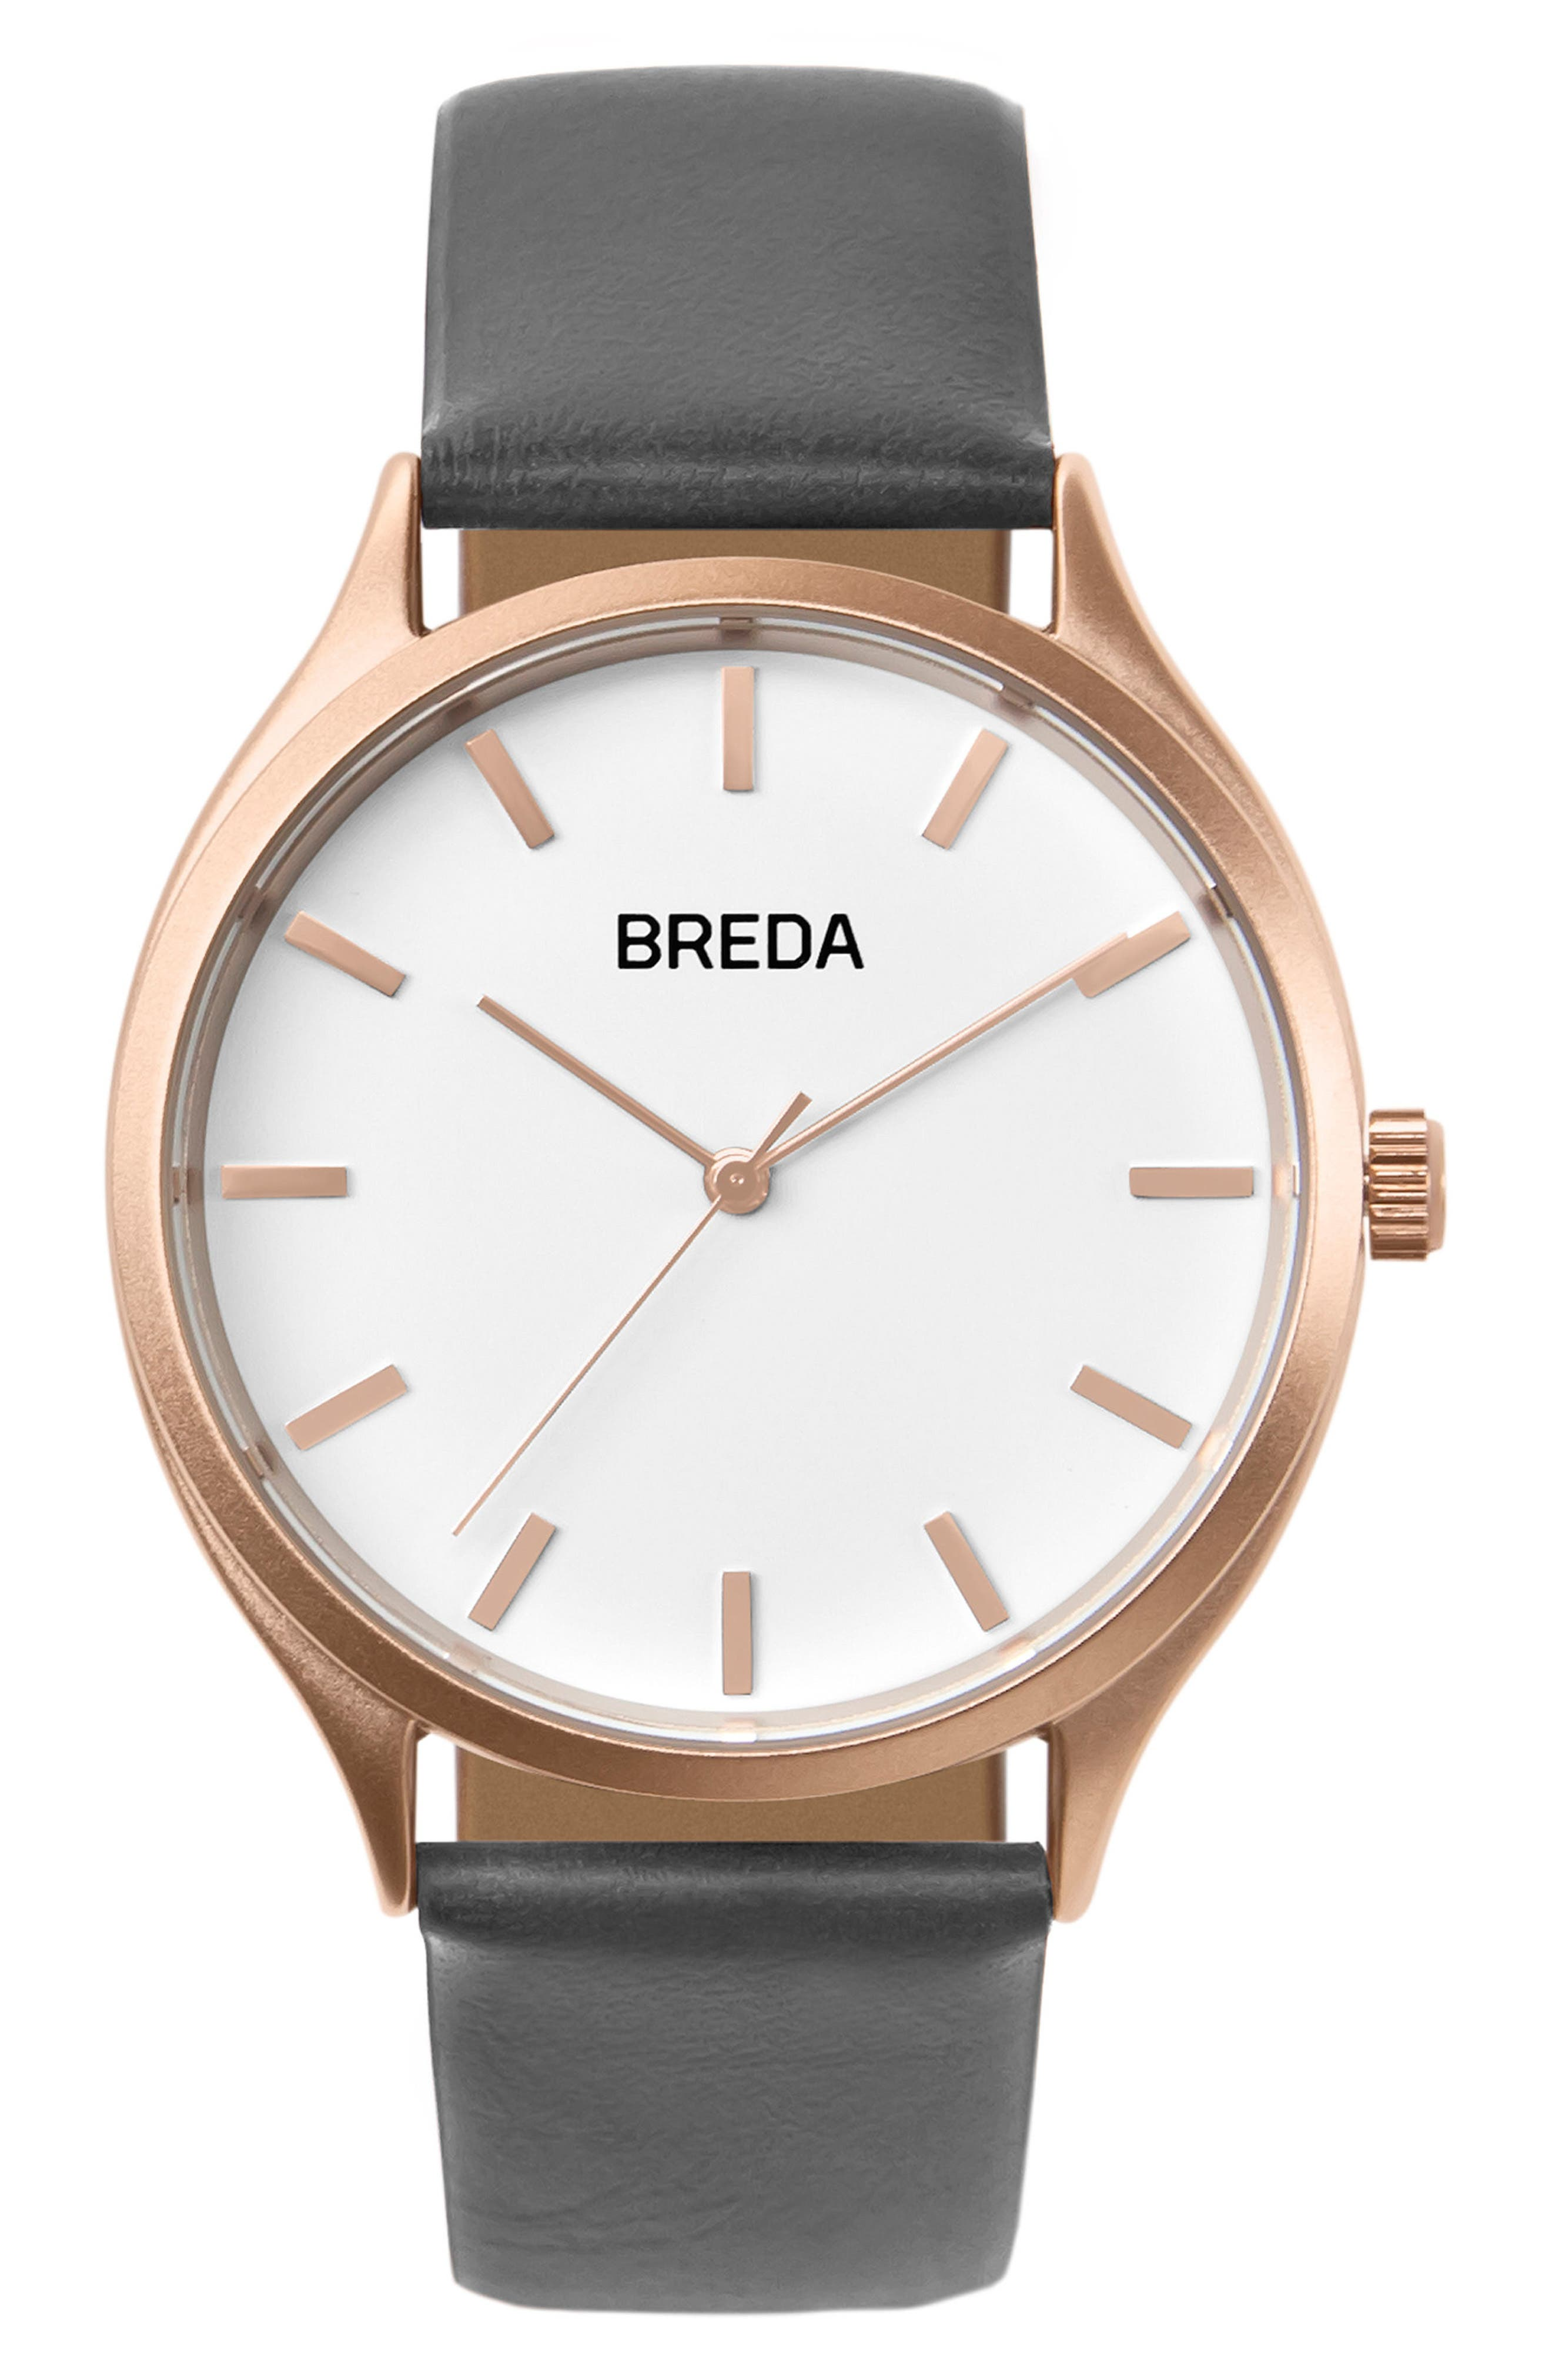 BREDA Asper Round Leather Strap Watch, 40mm